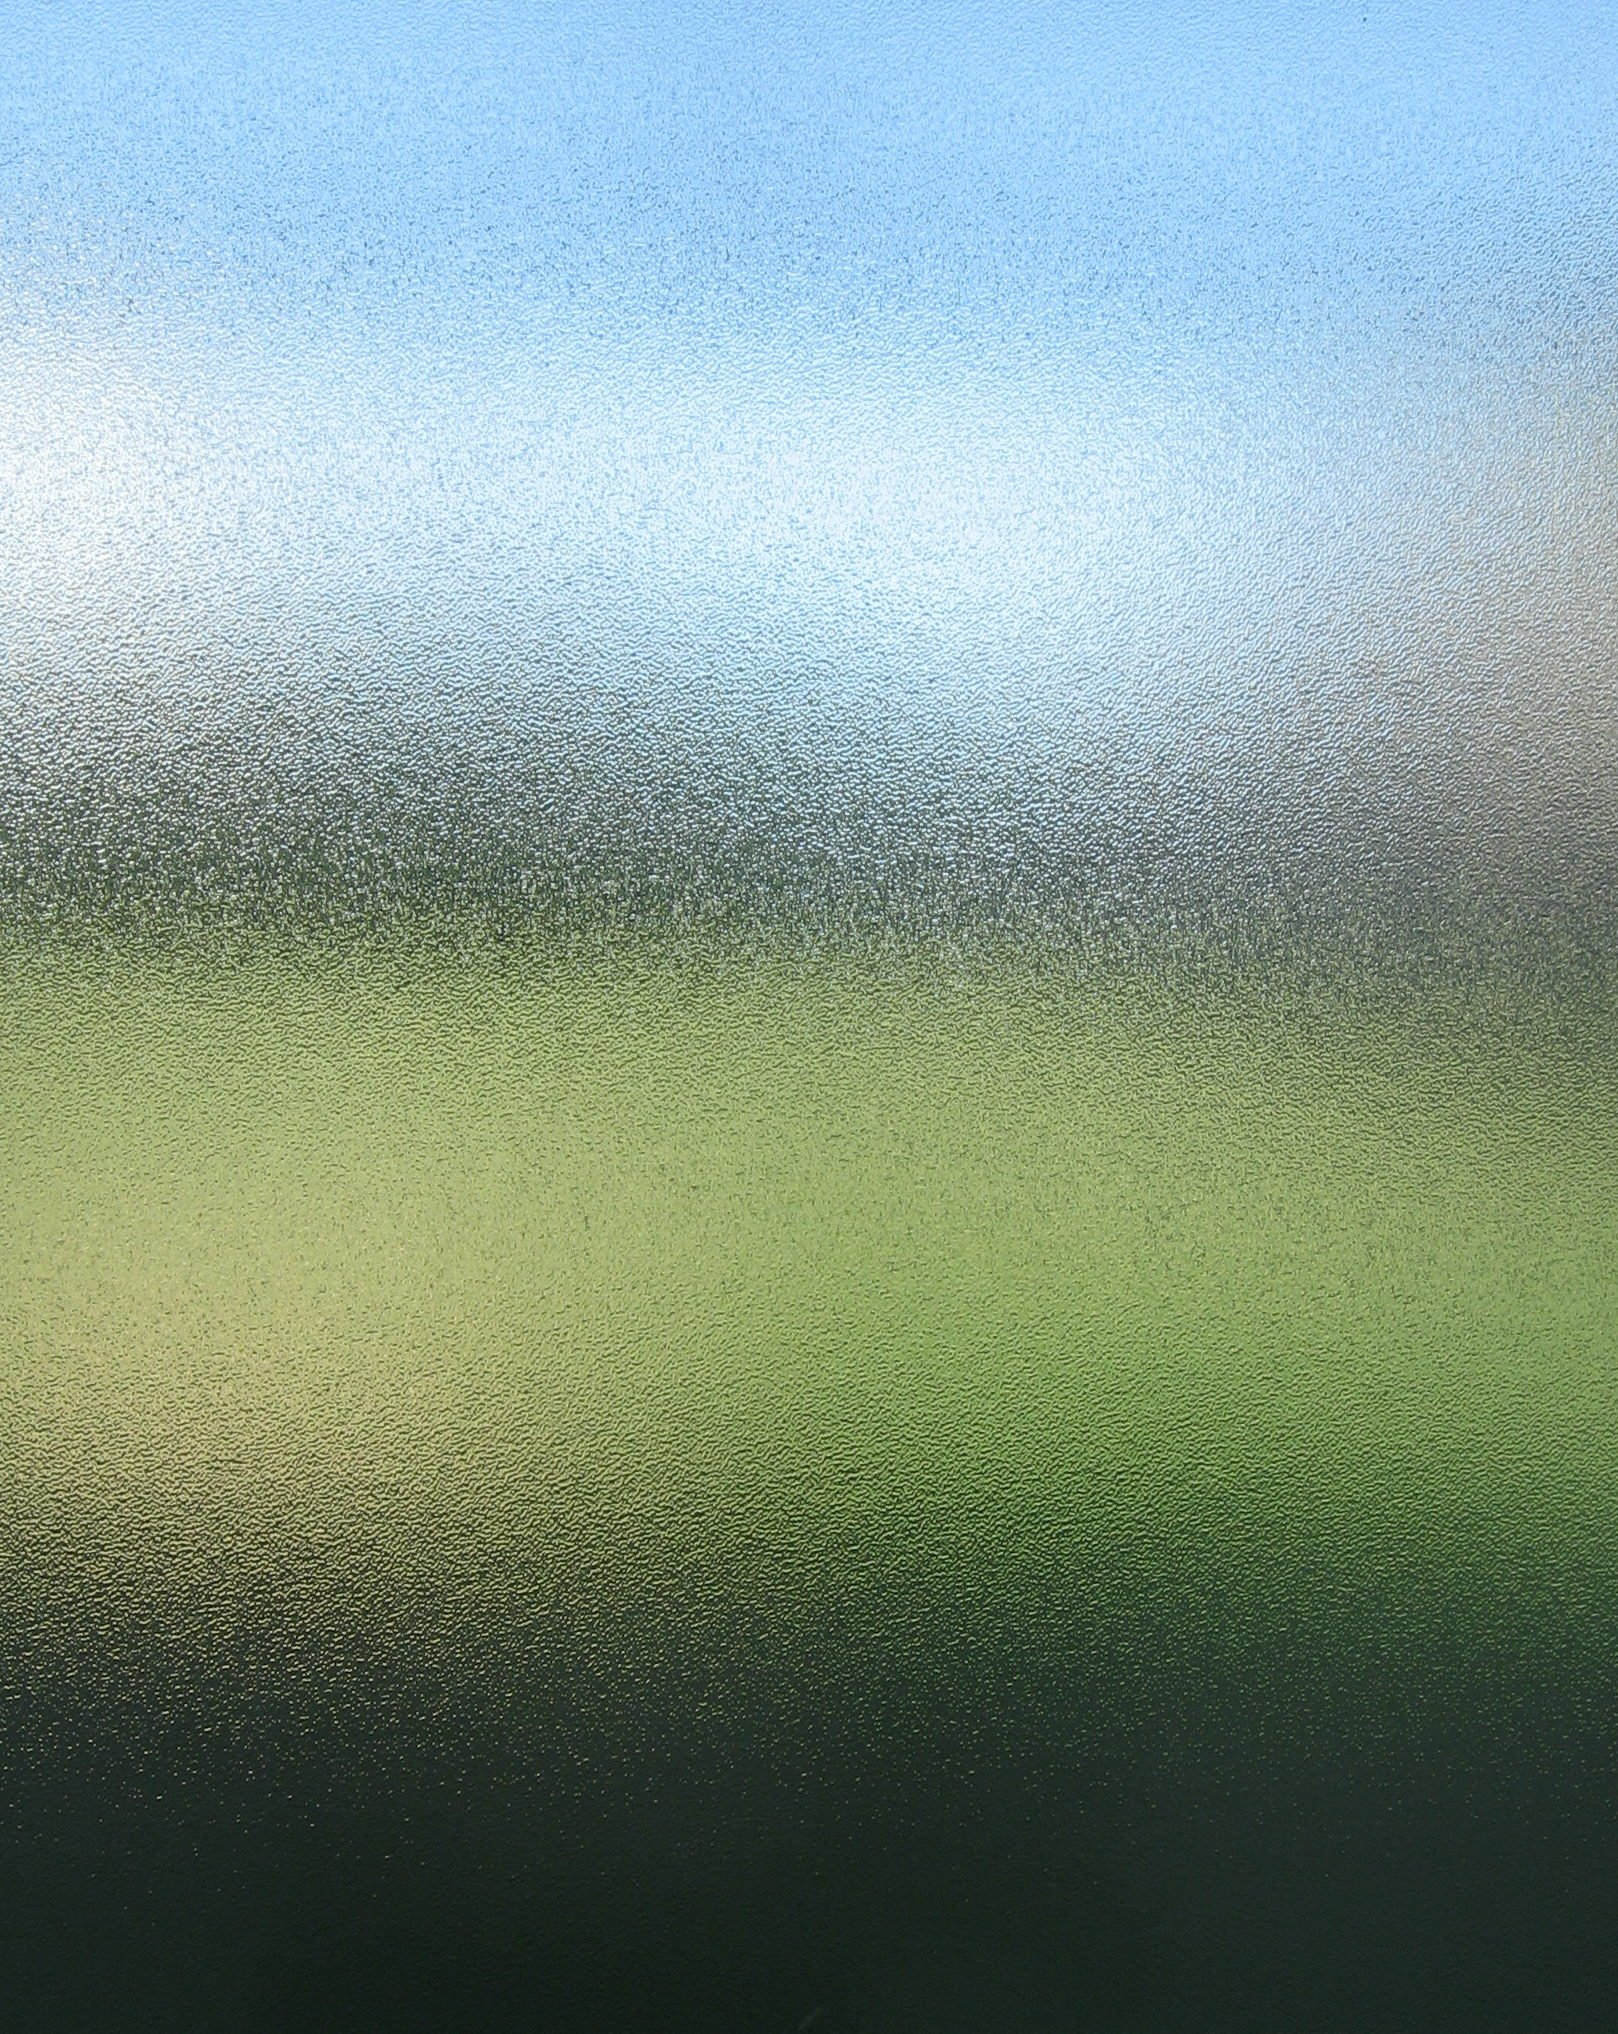 vitrerie miroiterie verre d poli acide verre clair d poli acide vitrage intimit satin. Black Bedroom Furniture Sets. Home Design Ideas